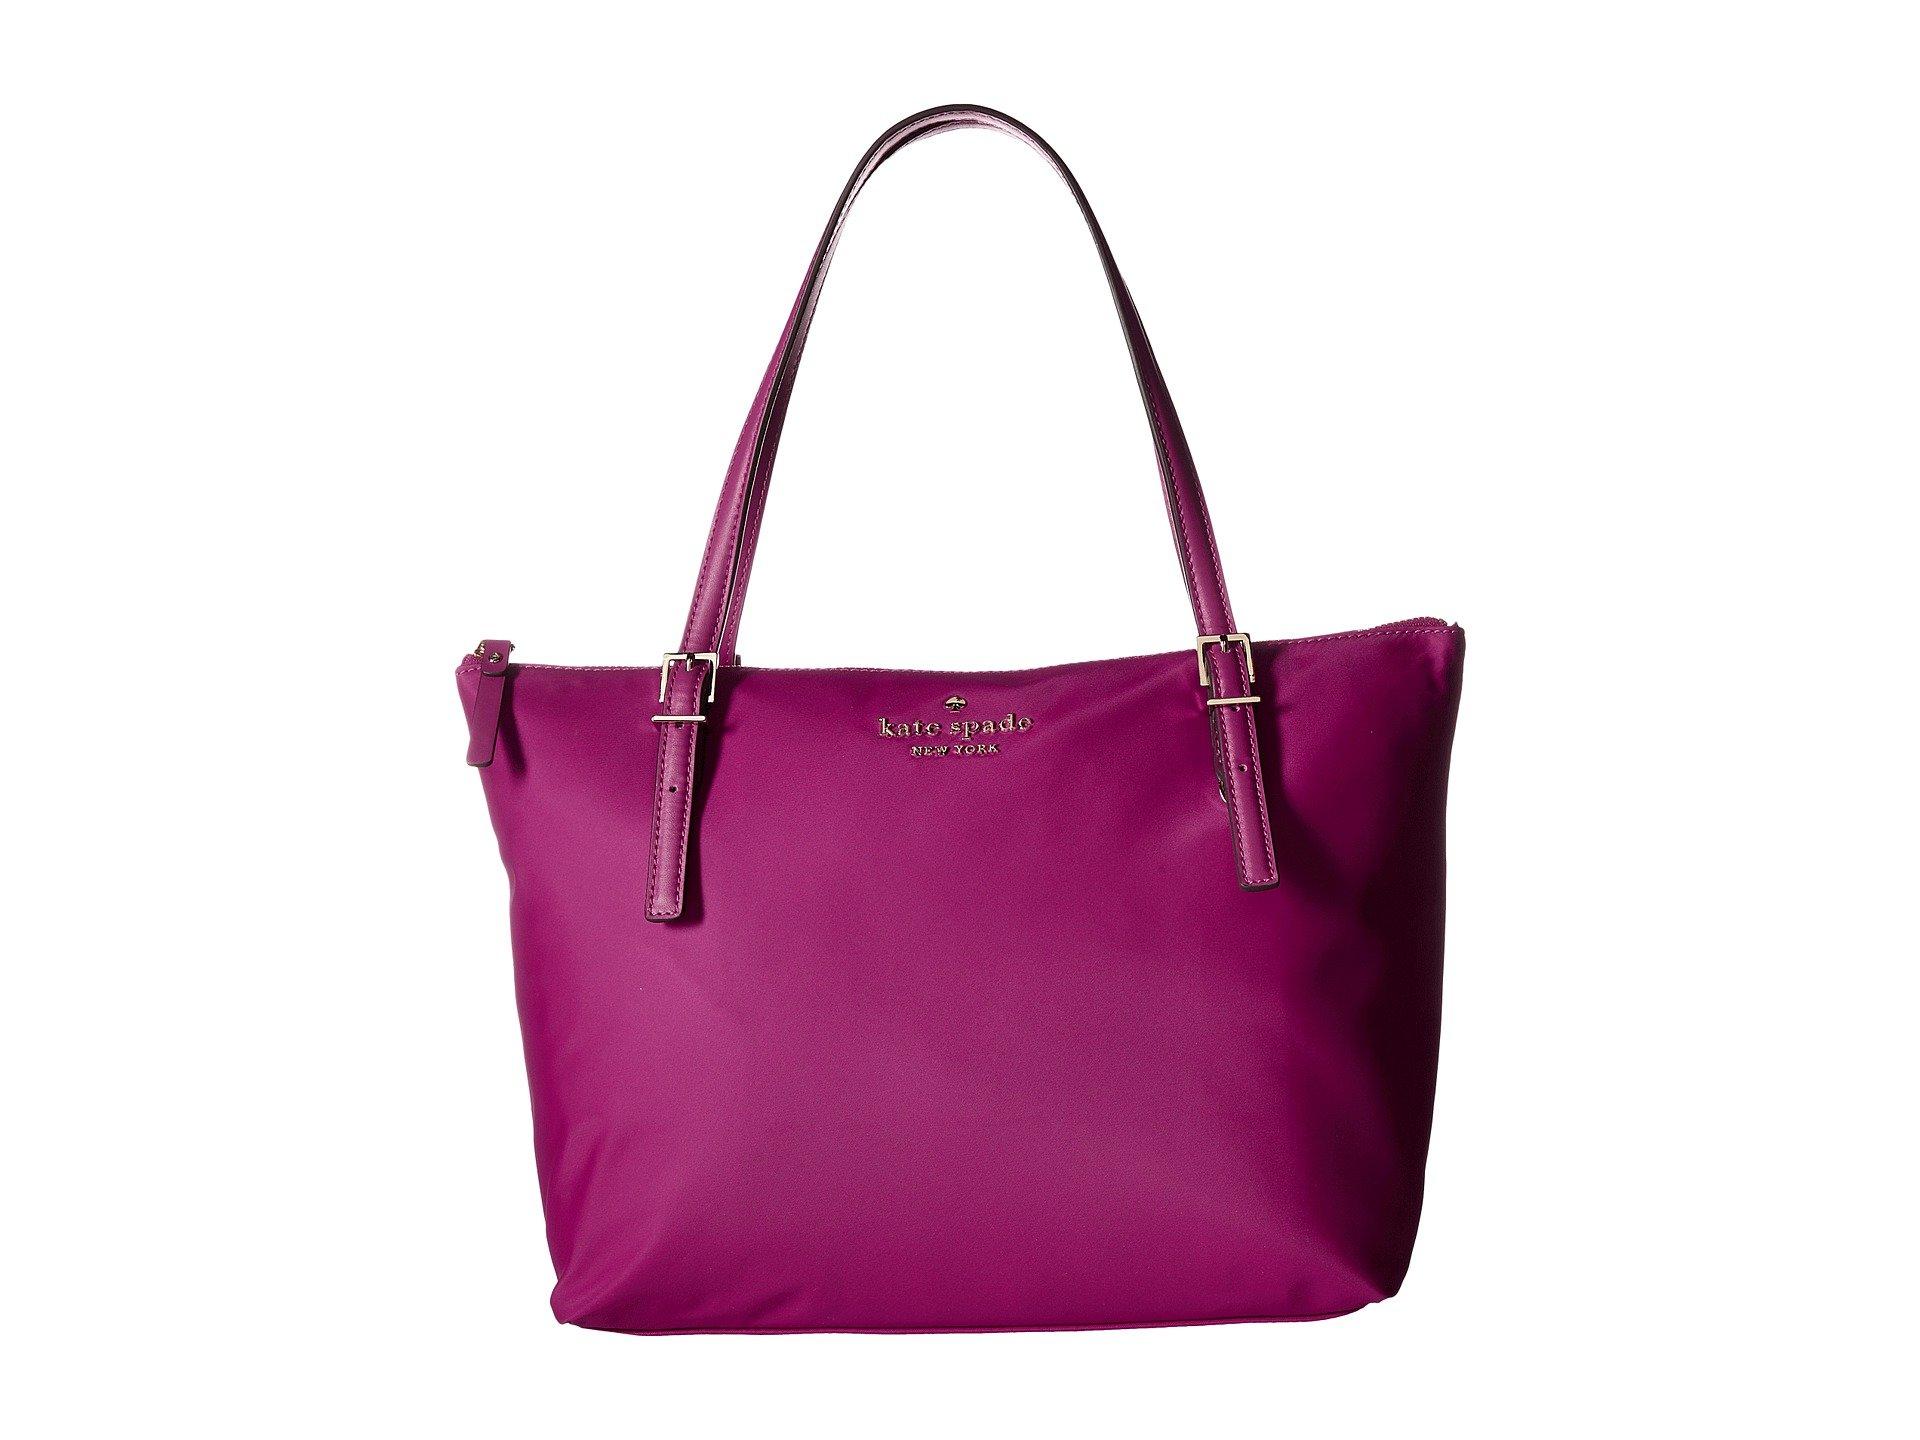 New Kate Spade New York Watson Lane Small Maya Handbags, Sweetheart